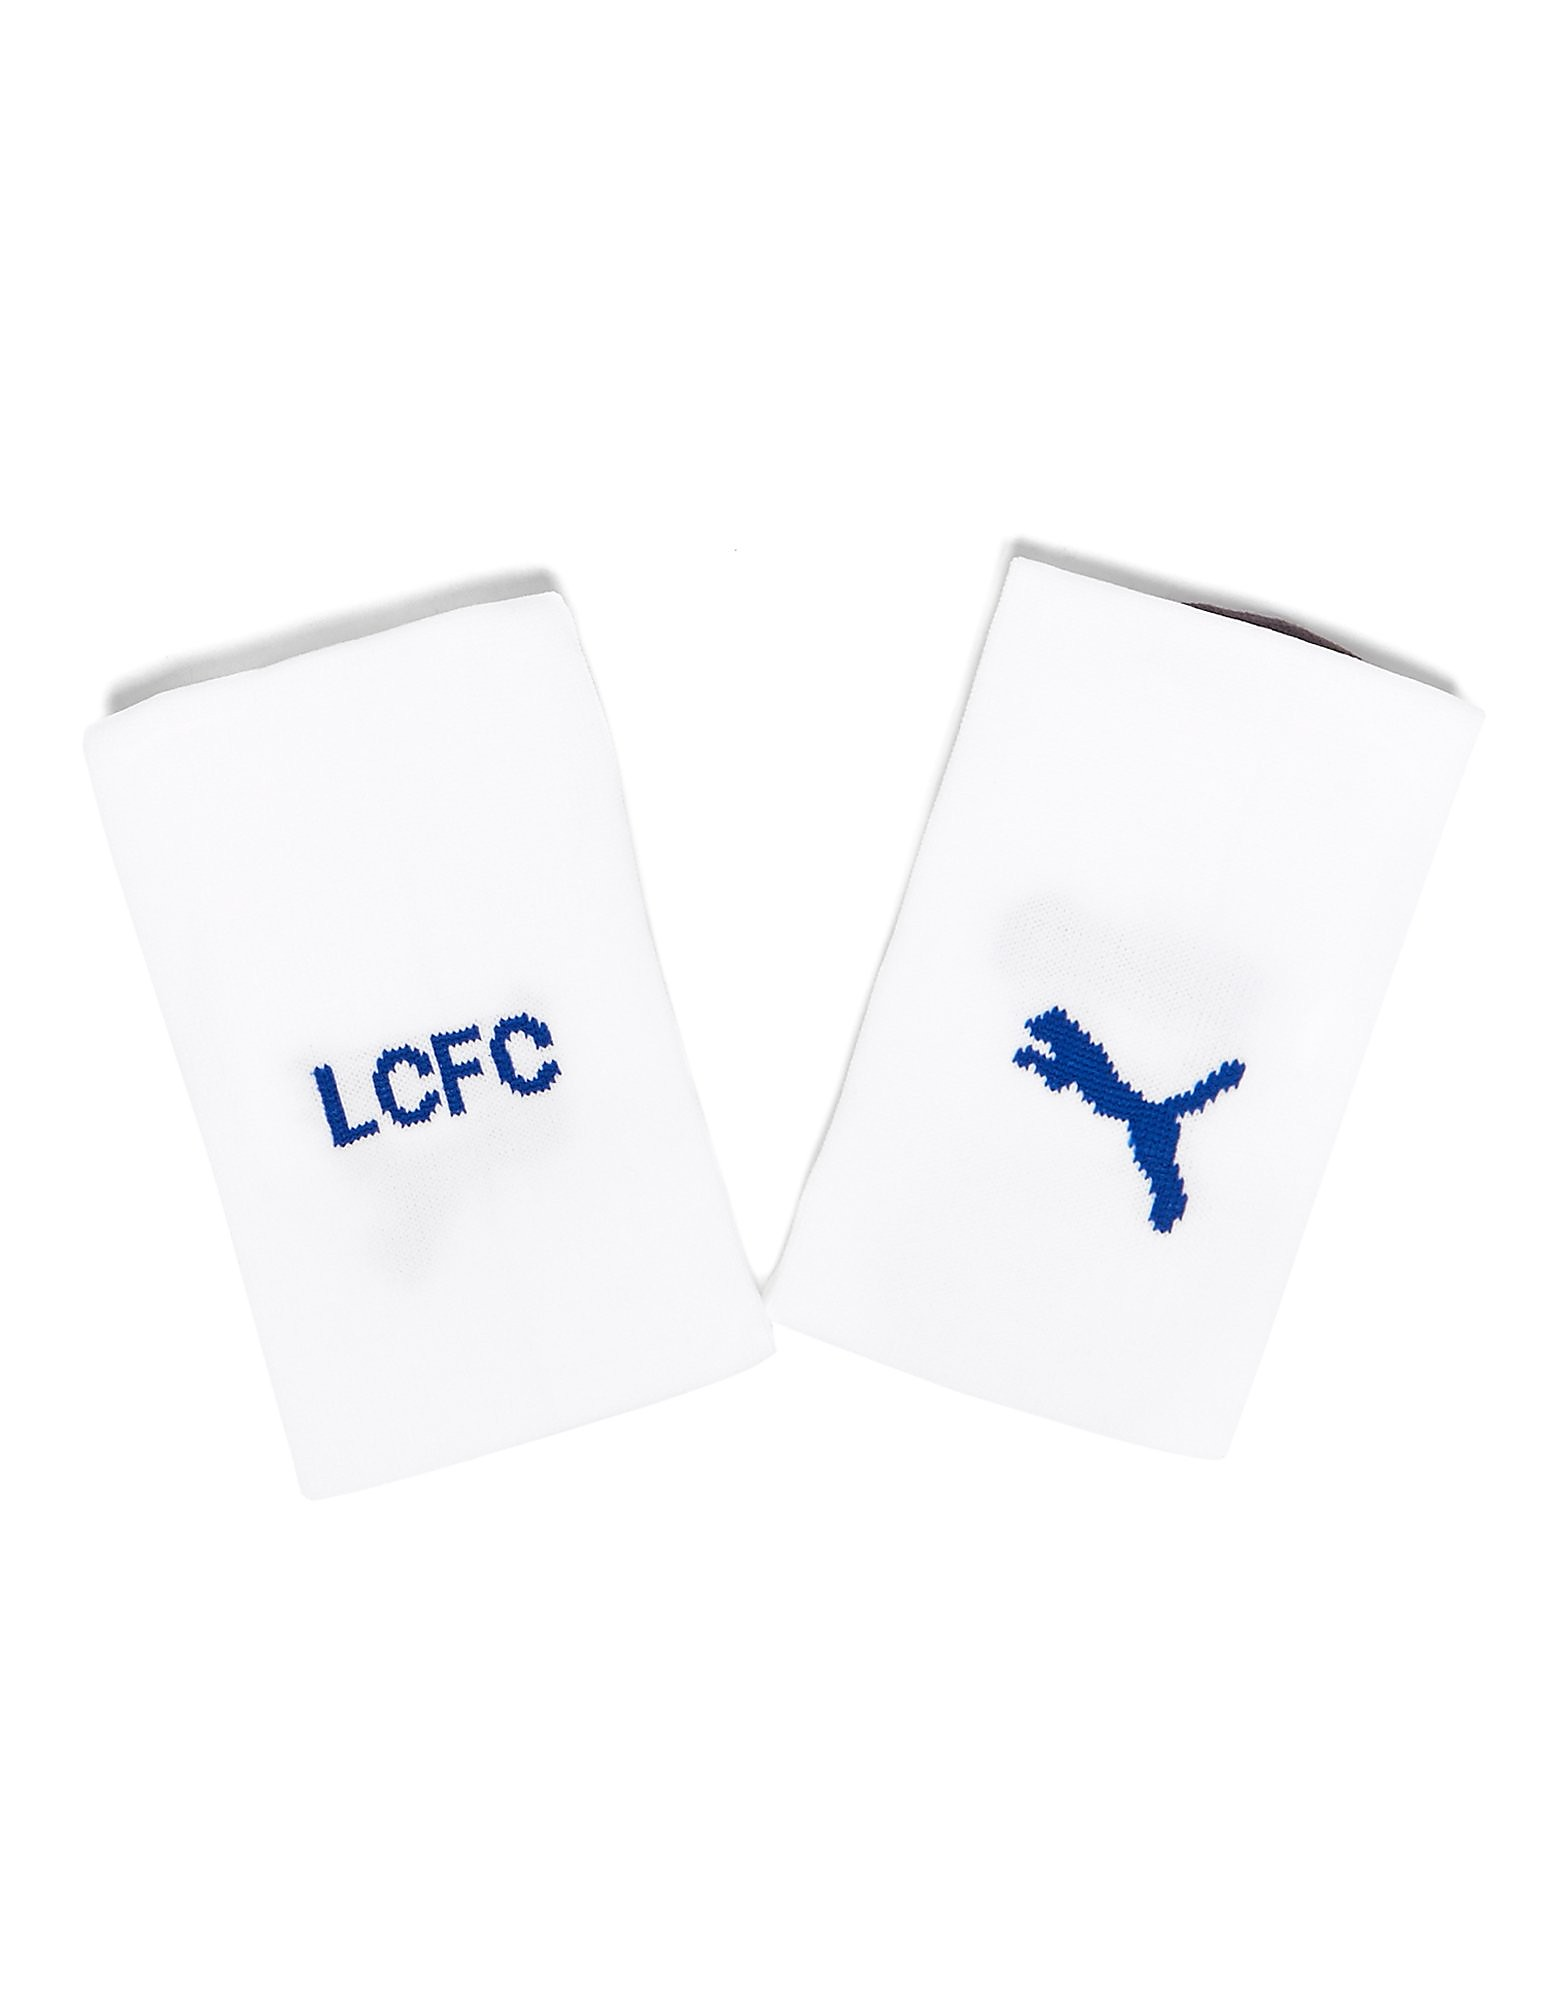 PUMA Leicester City 2017/18 Third Socks